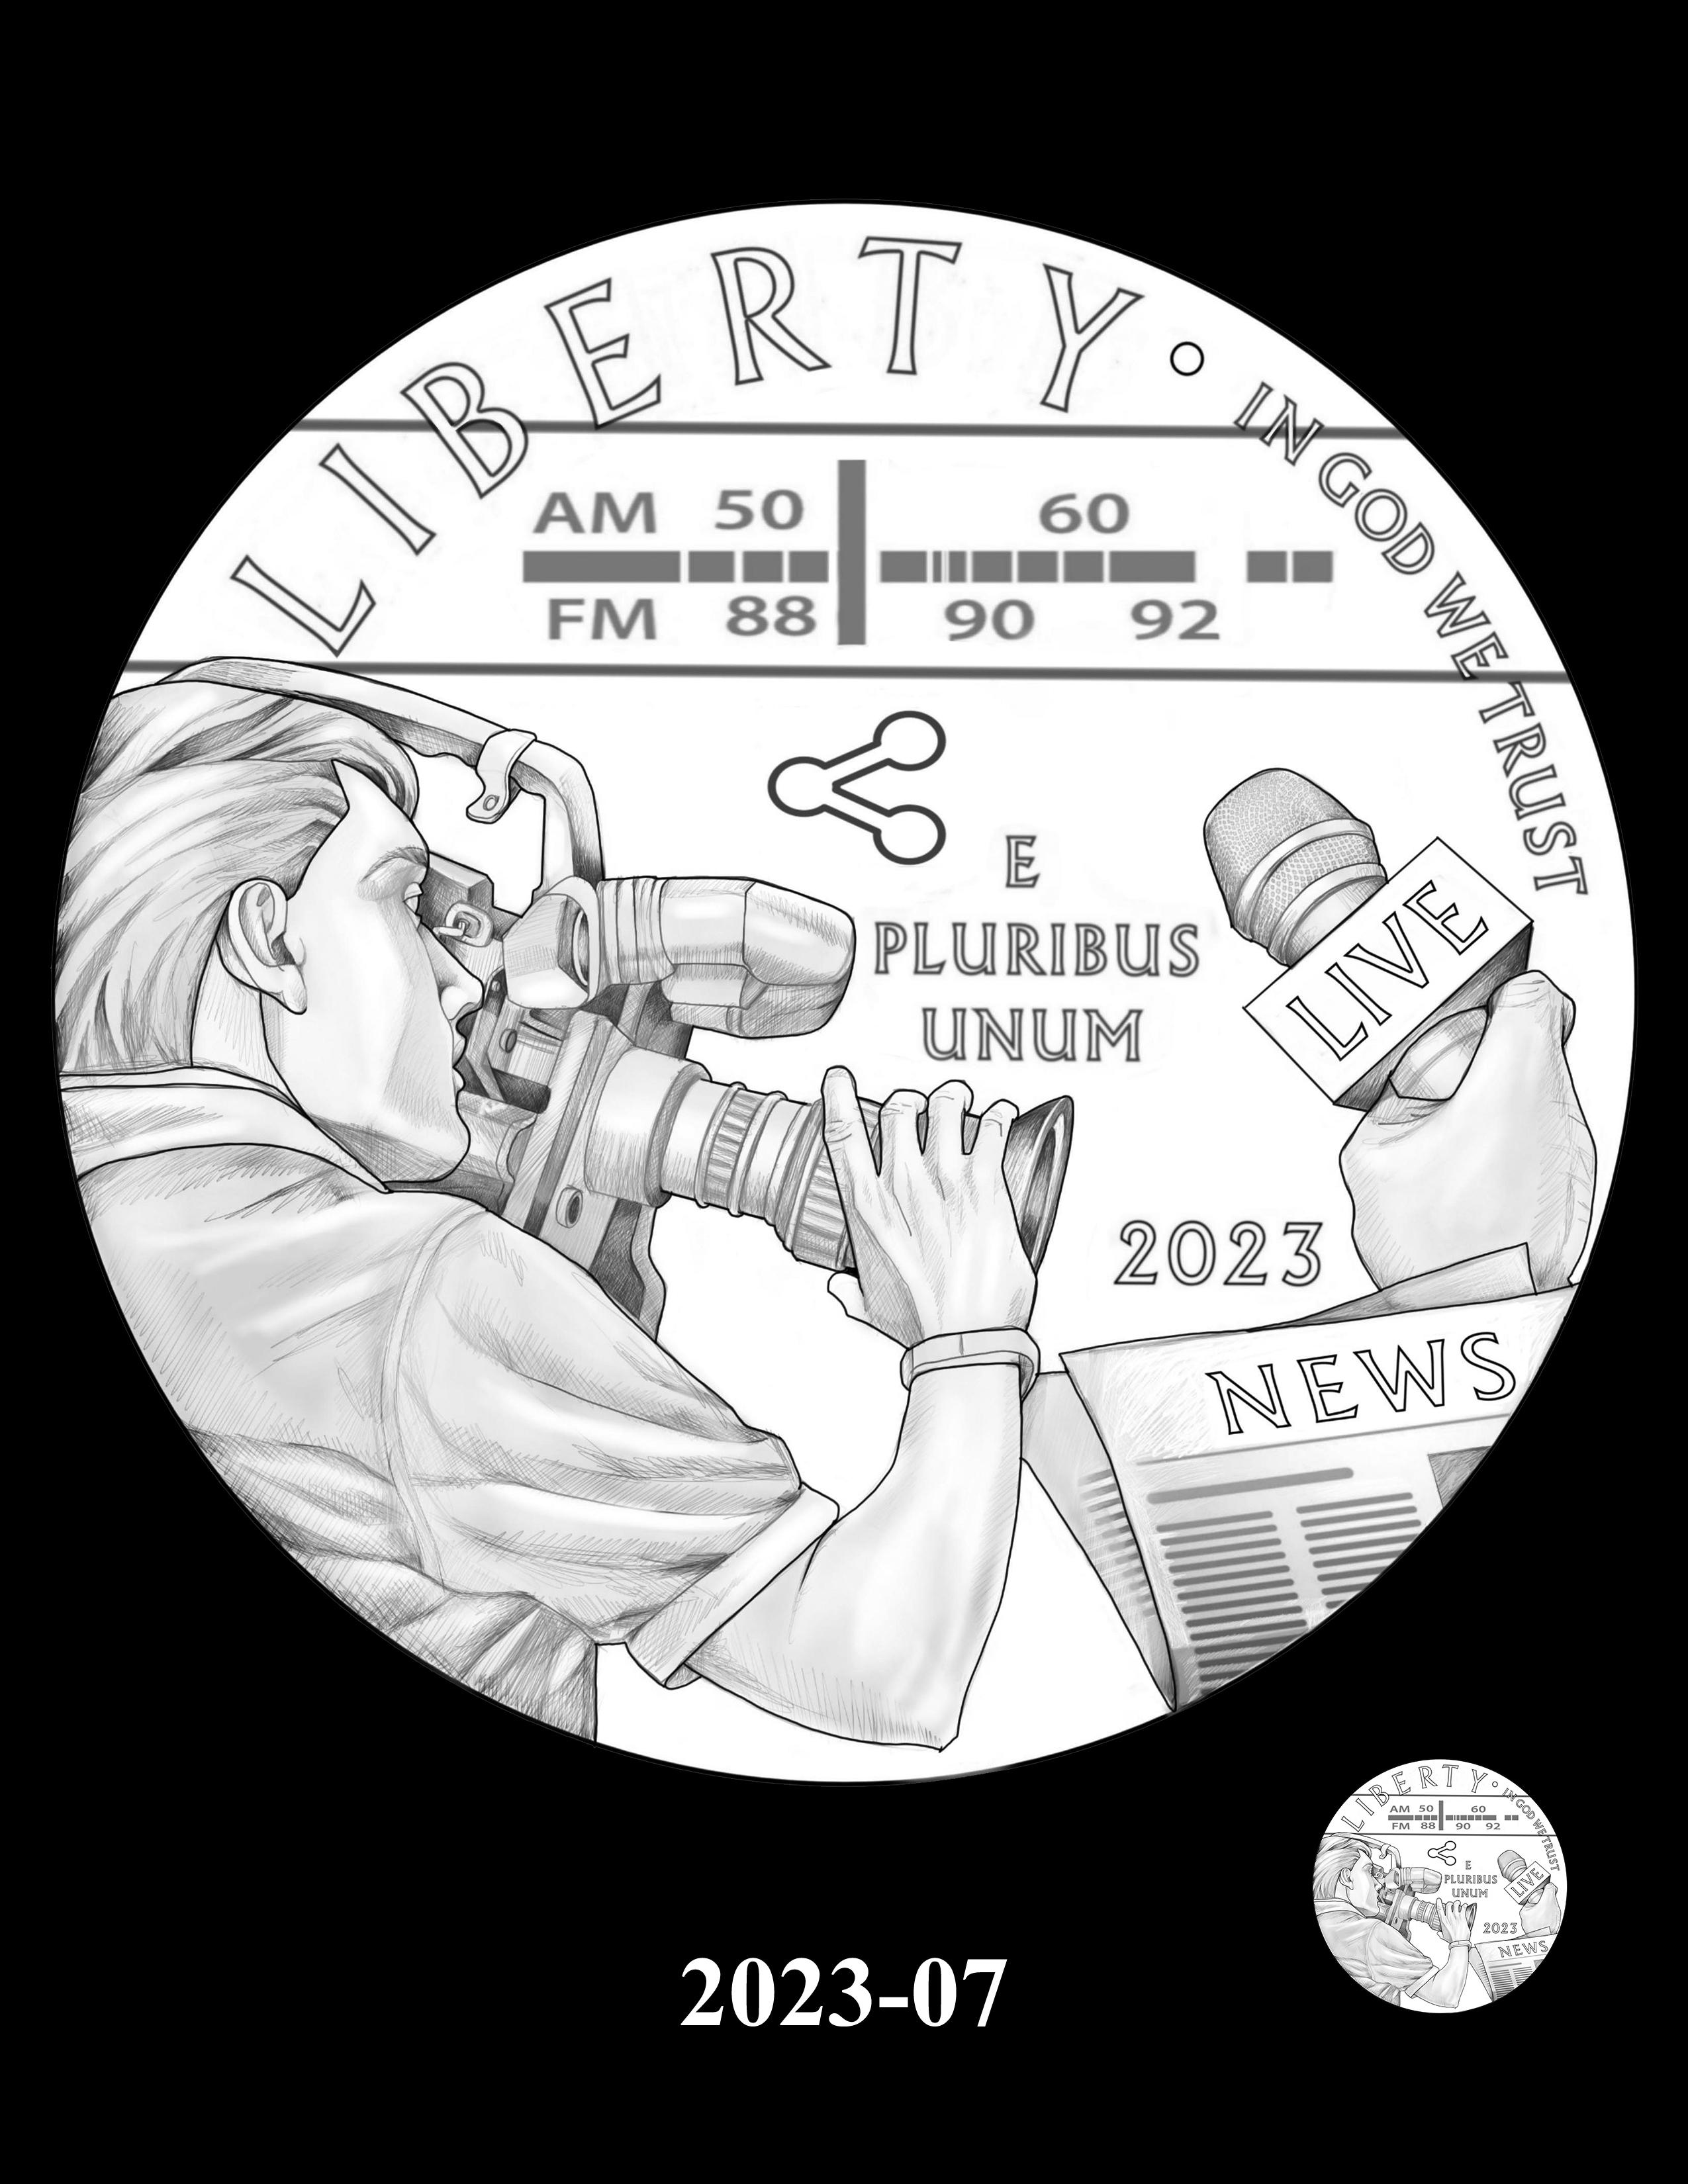 07-2023 -- 2021 - 2025 American Eagle Platinum Proof Program